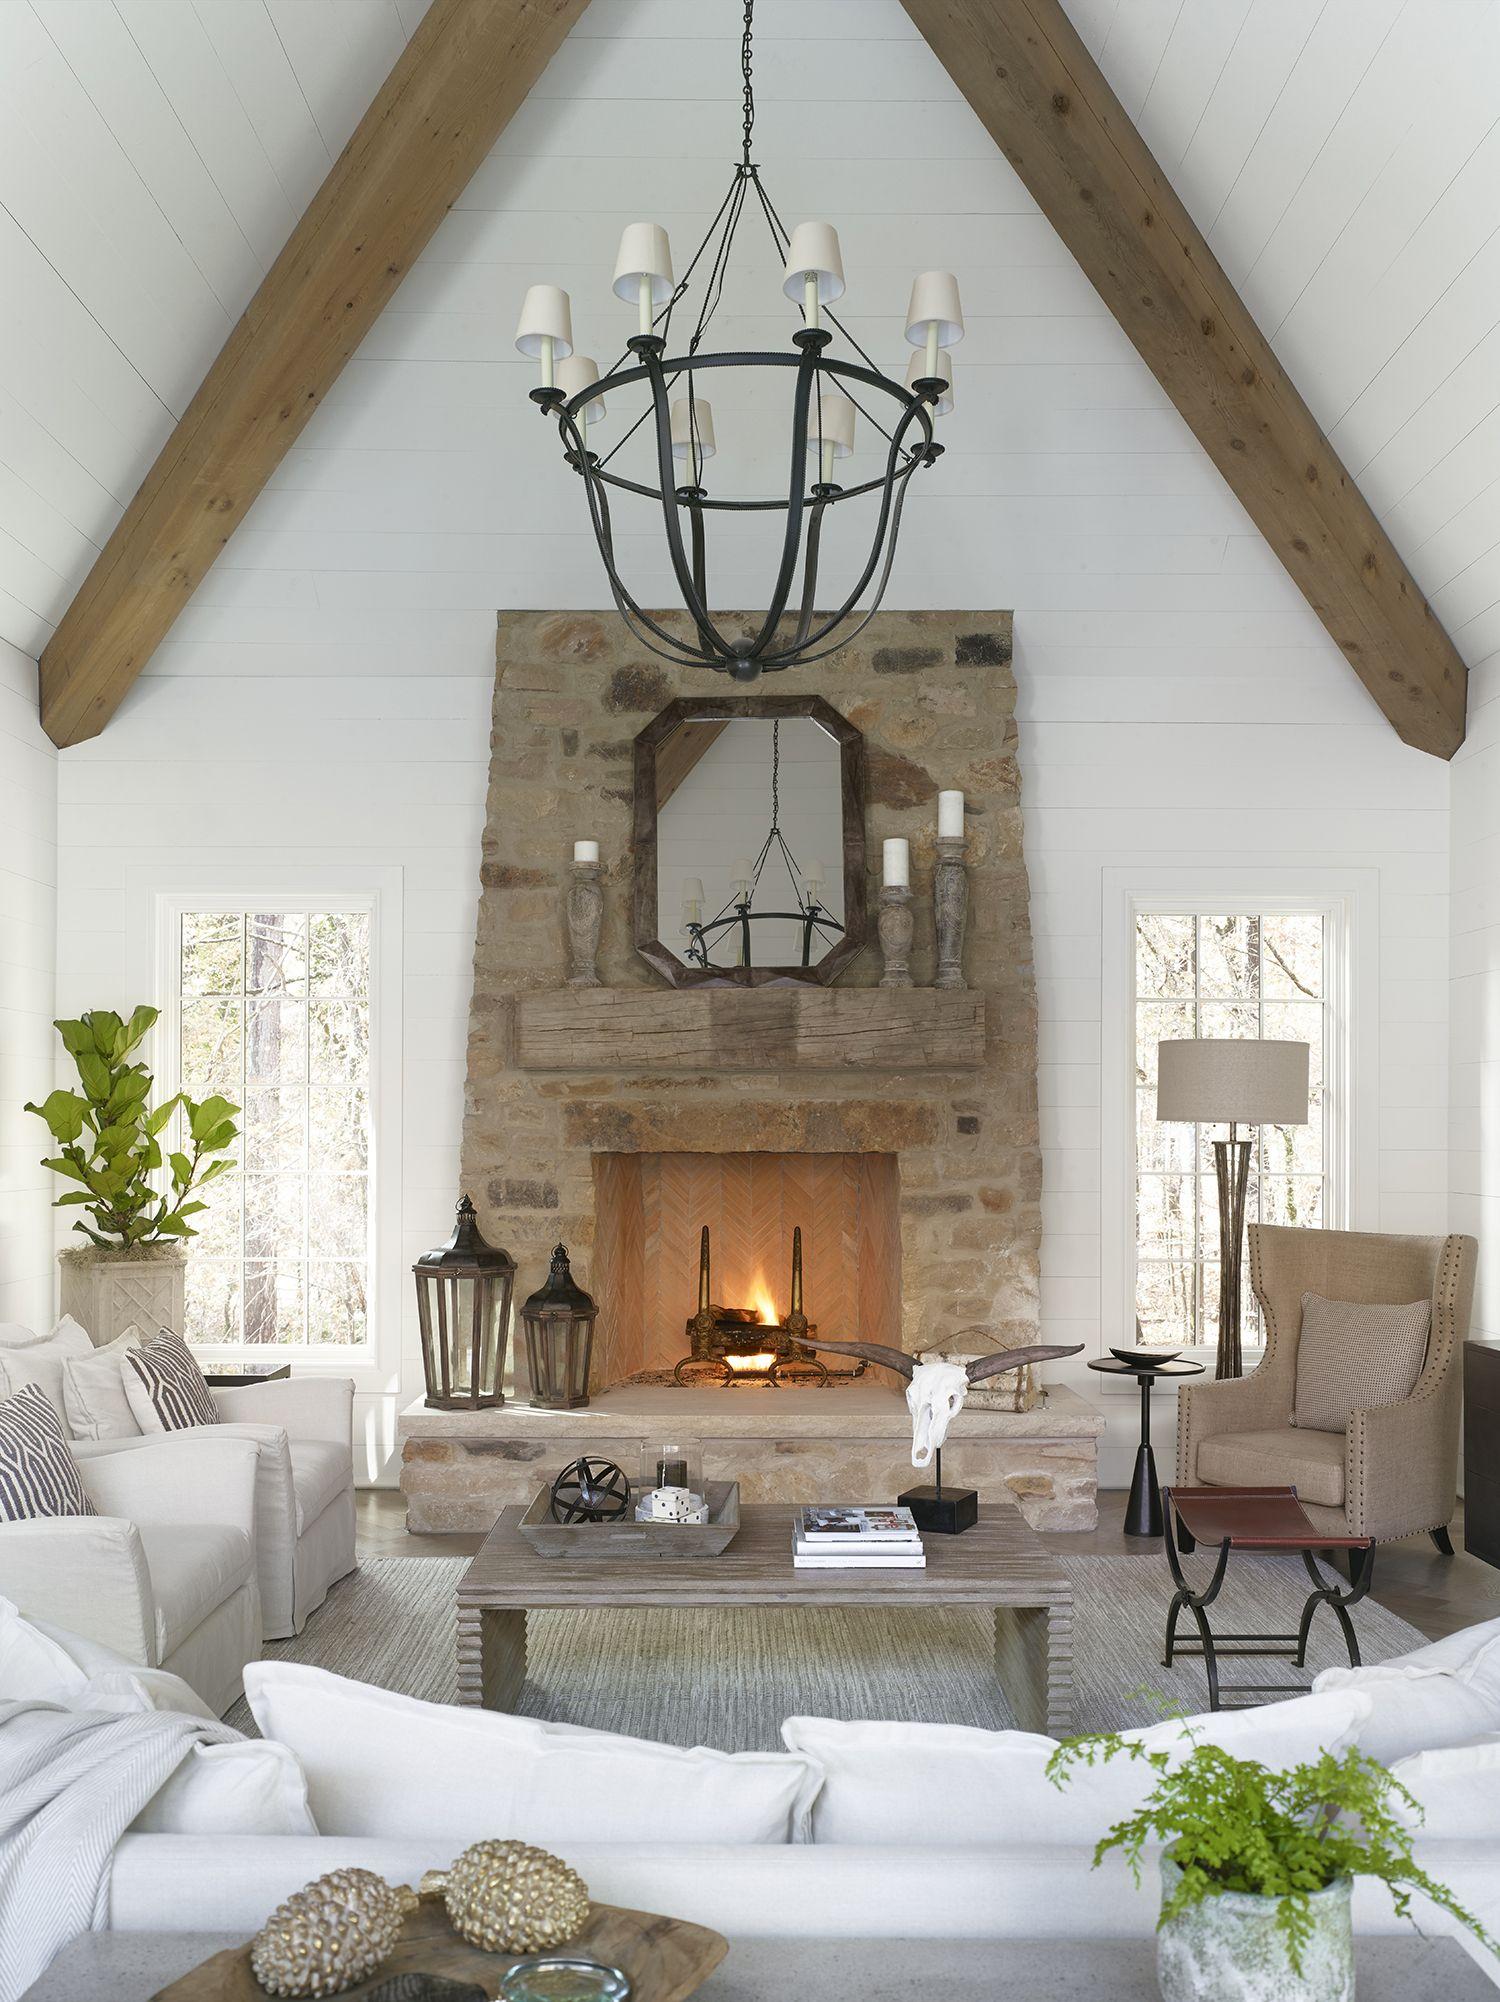 Stone Fireplace Timber Beams Farmhouse